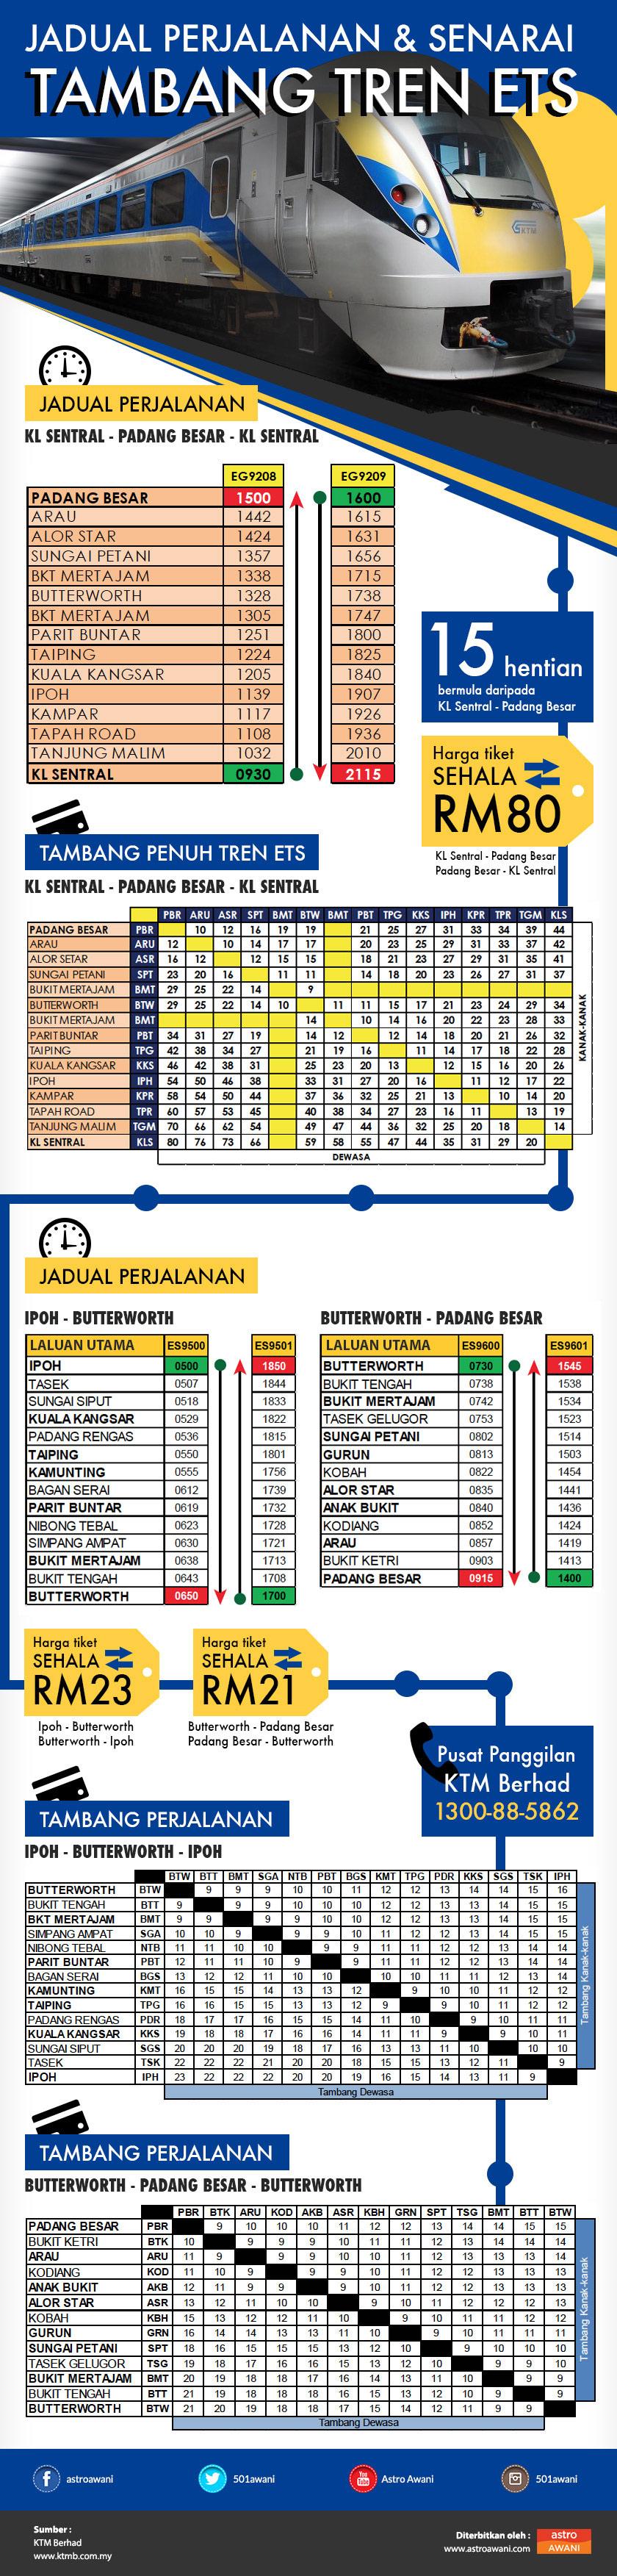 Infographic Kadar Perjalanan ETS